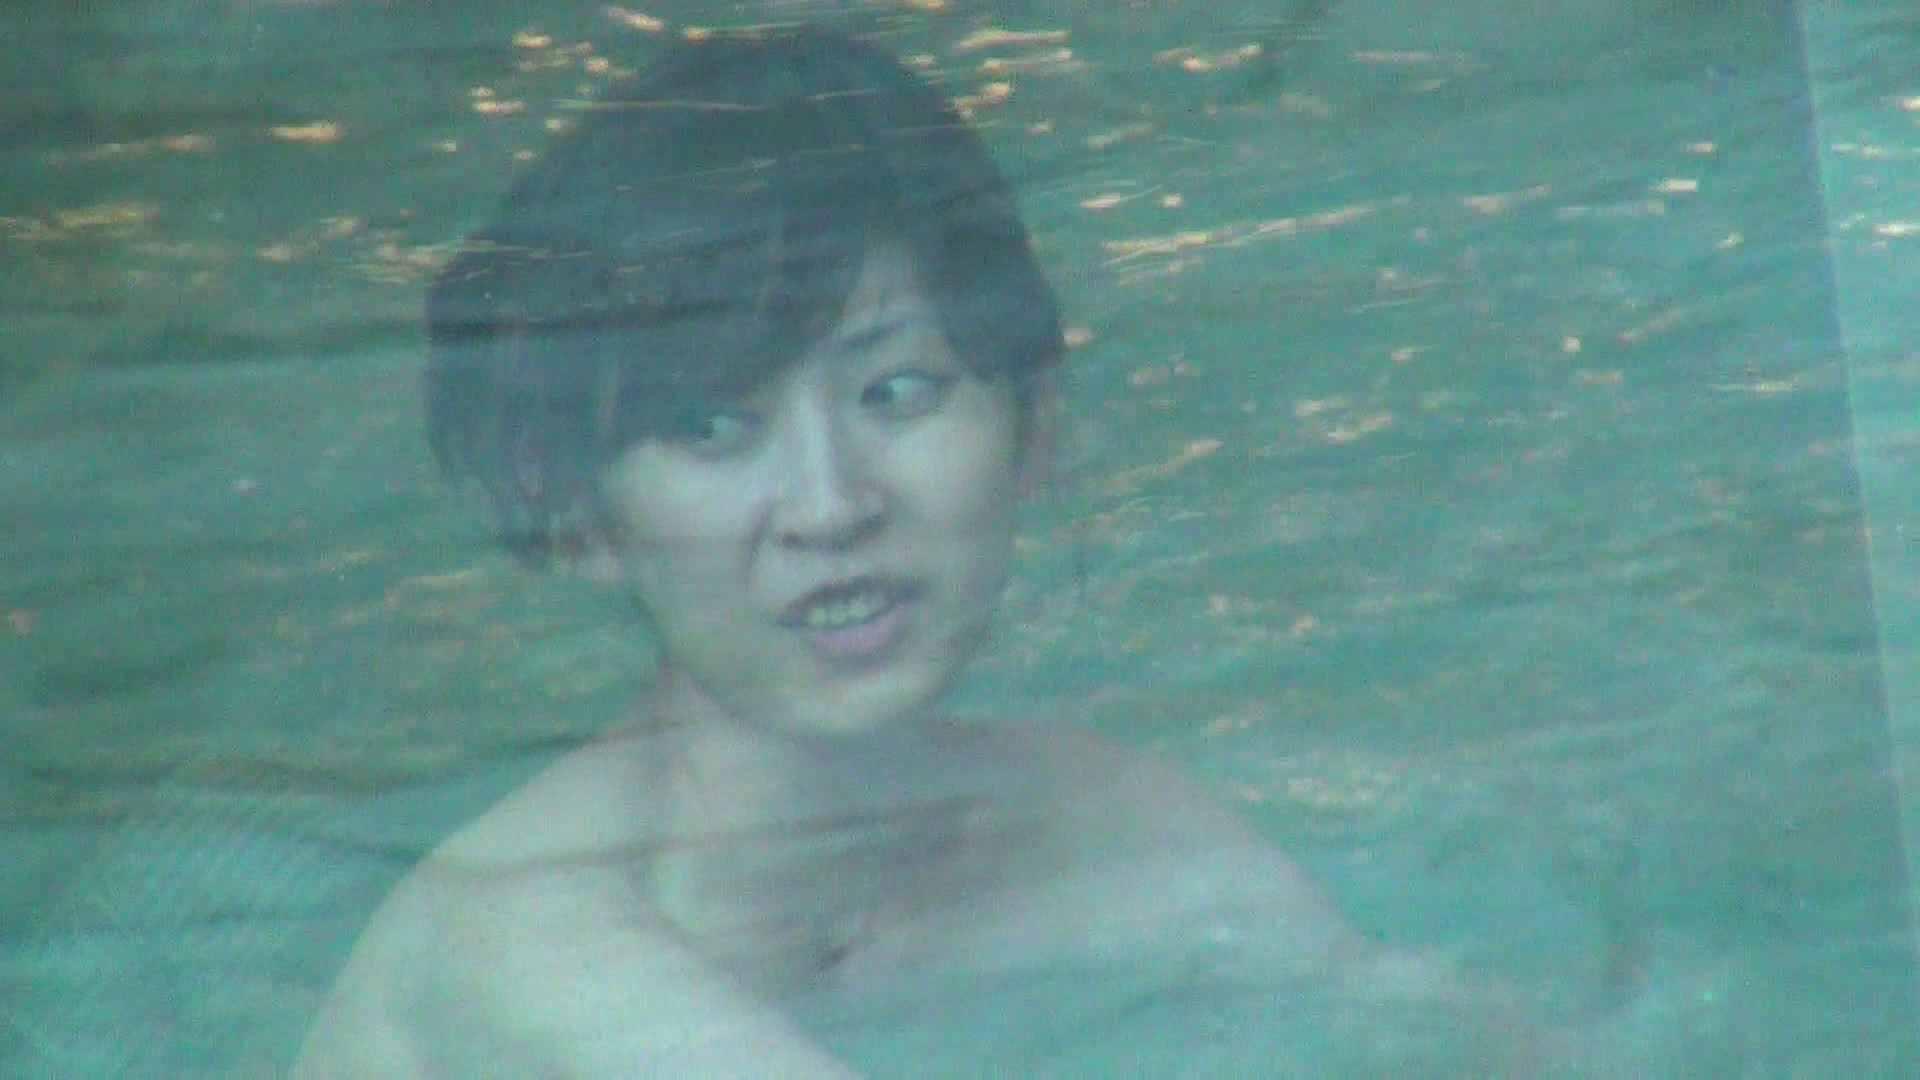 Aquaな露天風呂Vol.294 OLセックス | 盗撮  75画像 52